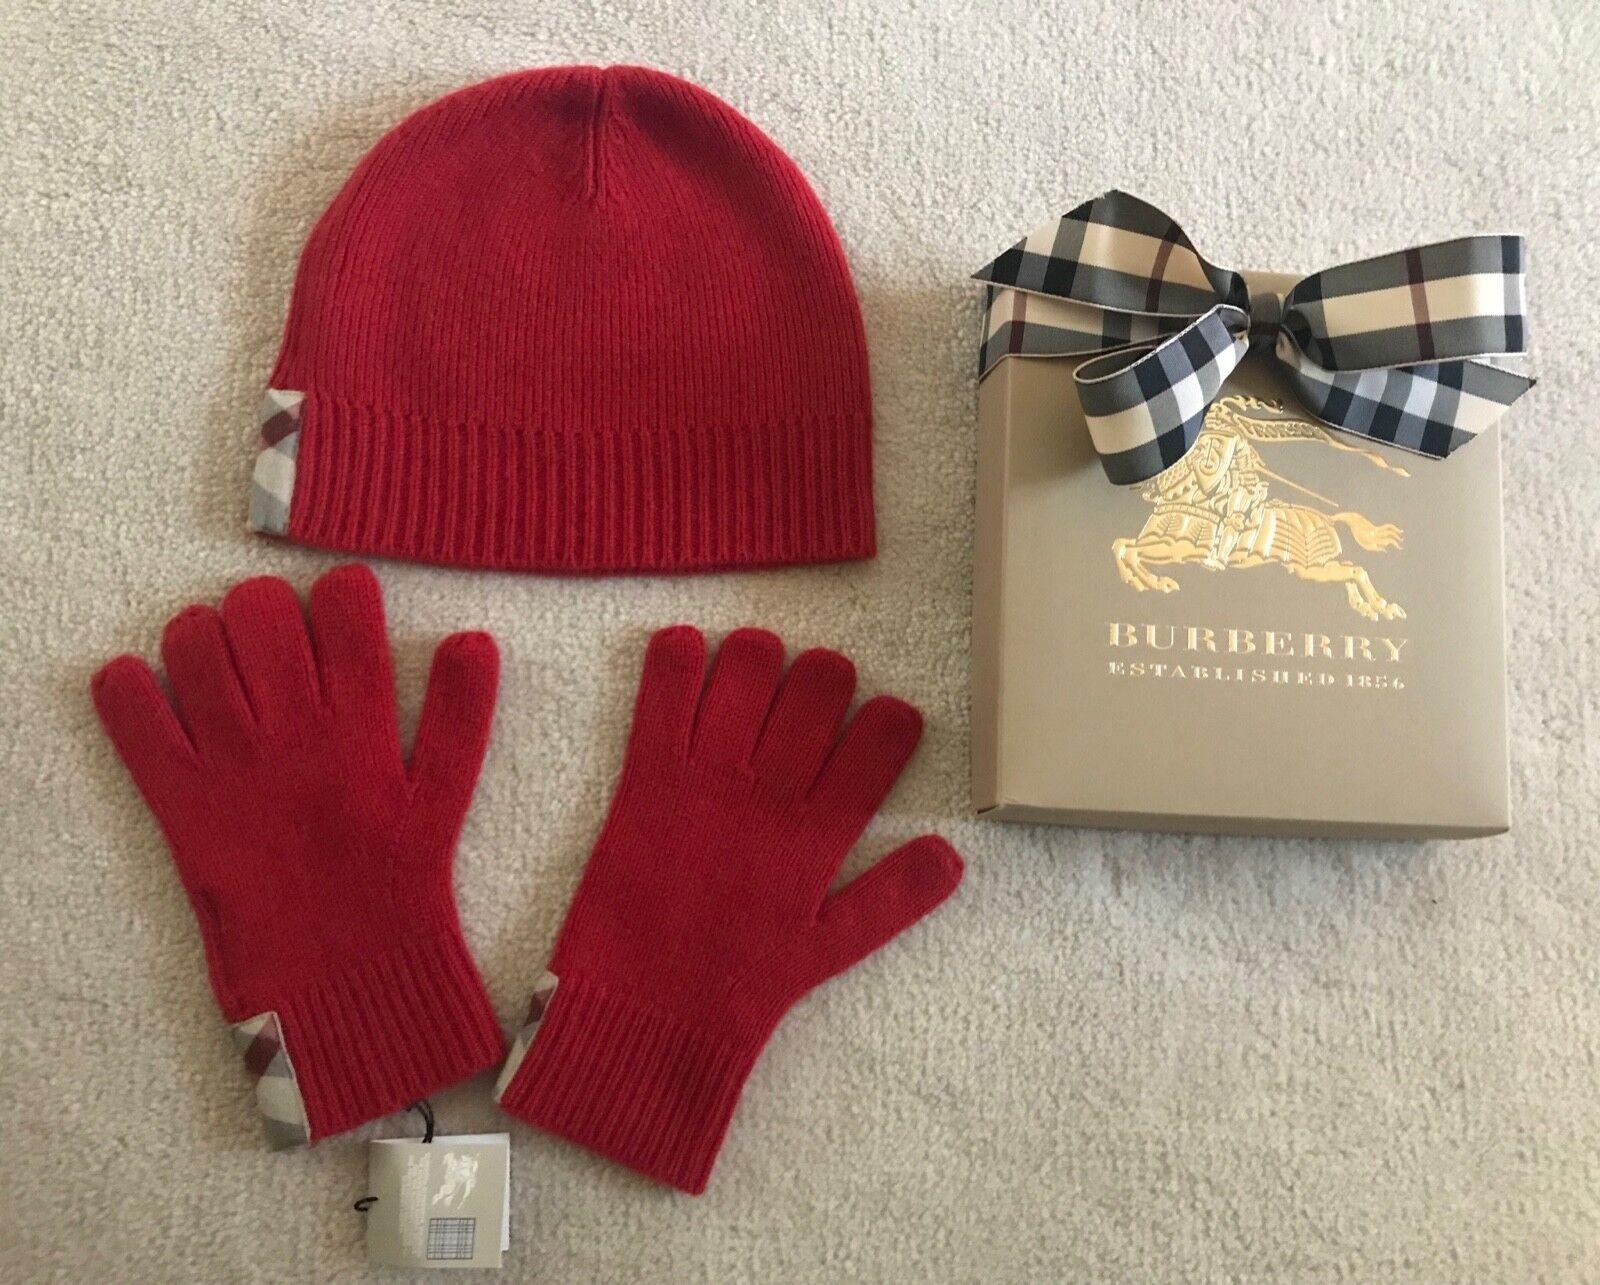 f3b02e993fb NWT BURBERRY Children Girls Boys Red Cashmere Checks Beanie   Gloves Set Sz  M L